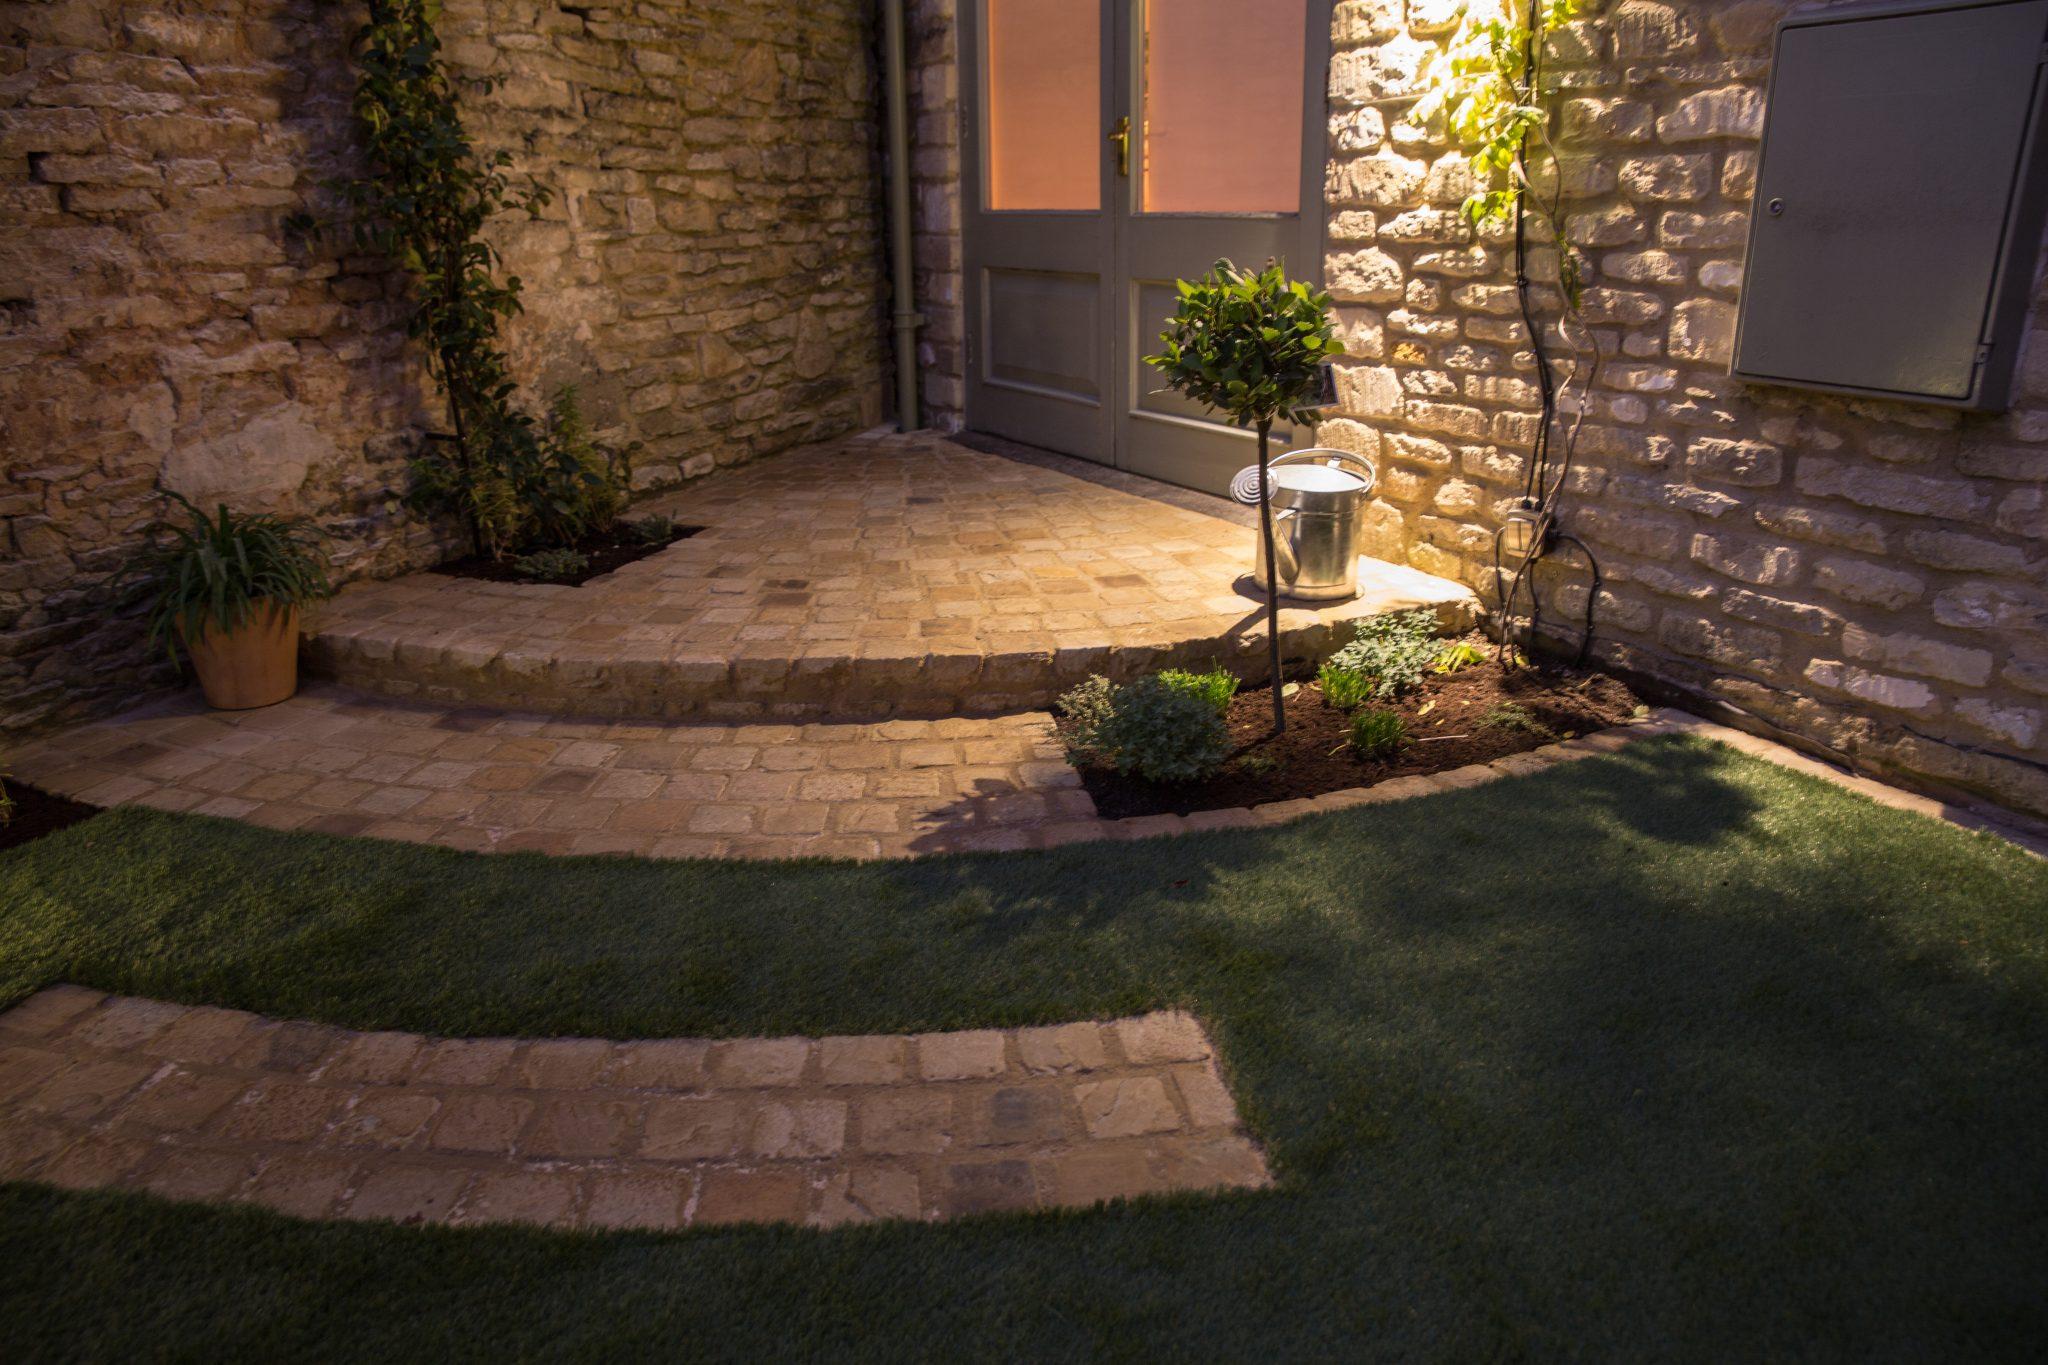 garden makeover oxfordshire, oxford garden design